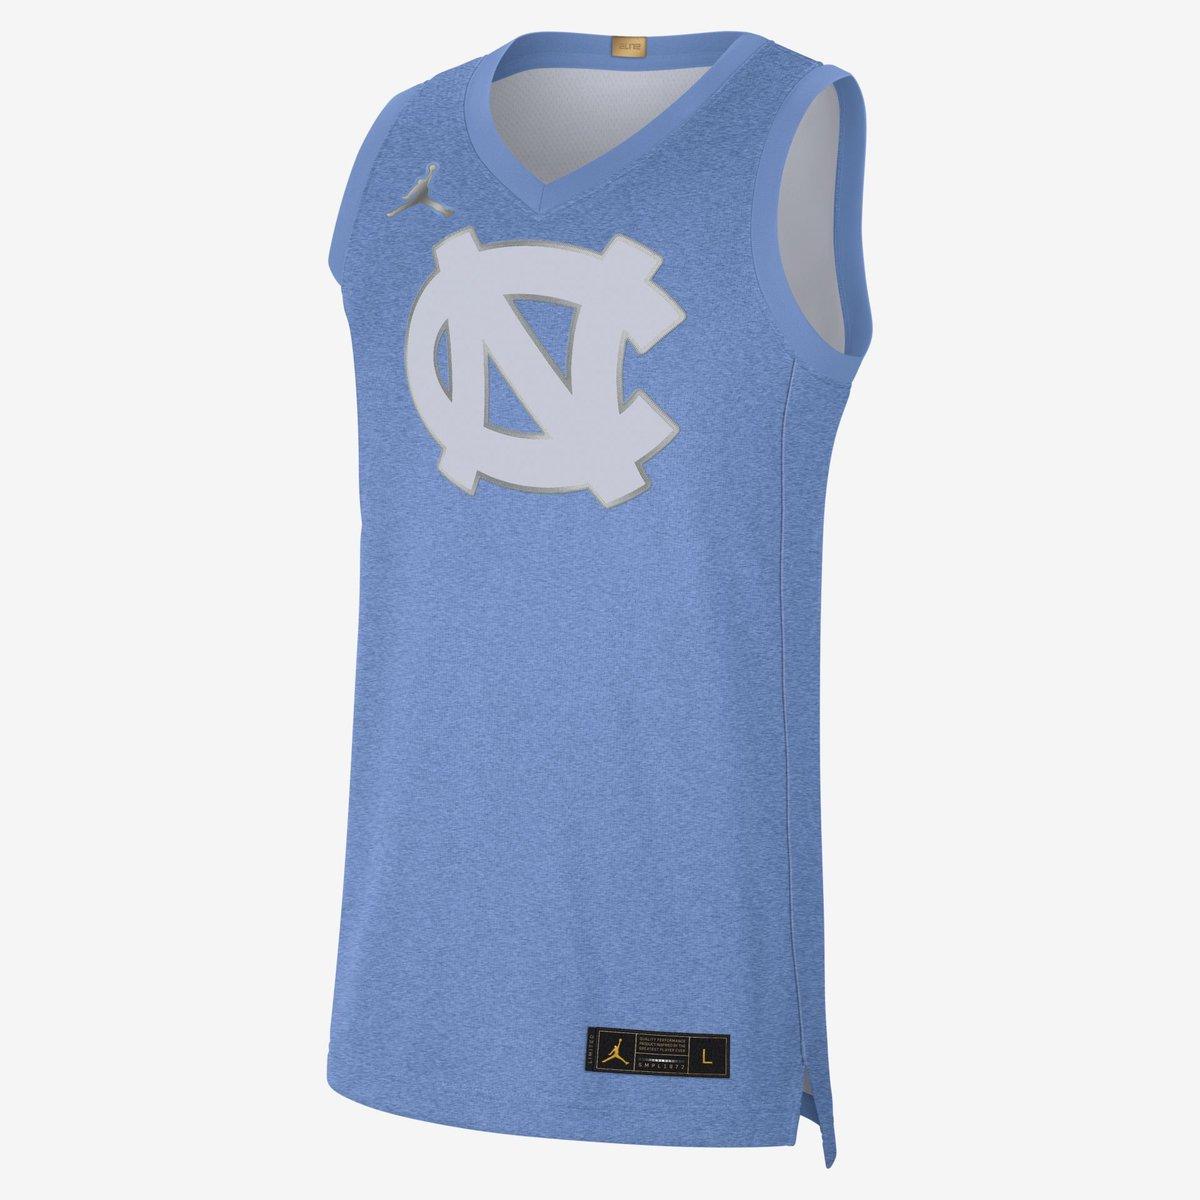 UNC/Duke Rivalry Uniform 25%+ OFF on @nikestore. No code needed.  UNC Jersey ->  Shorts ->   Duke Jersey ->  Shorts ->